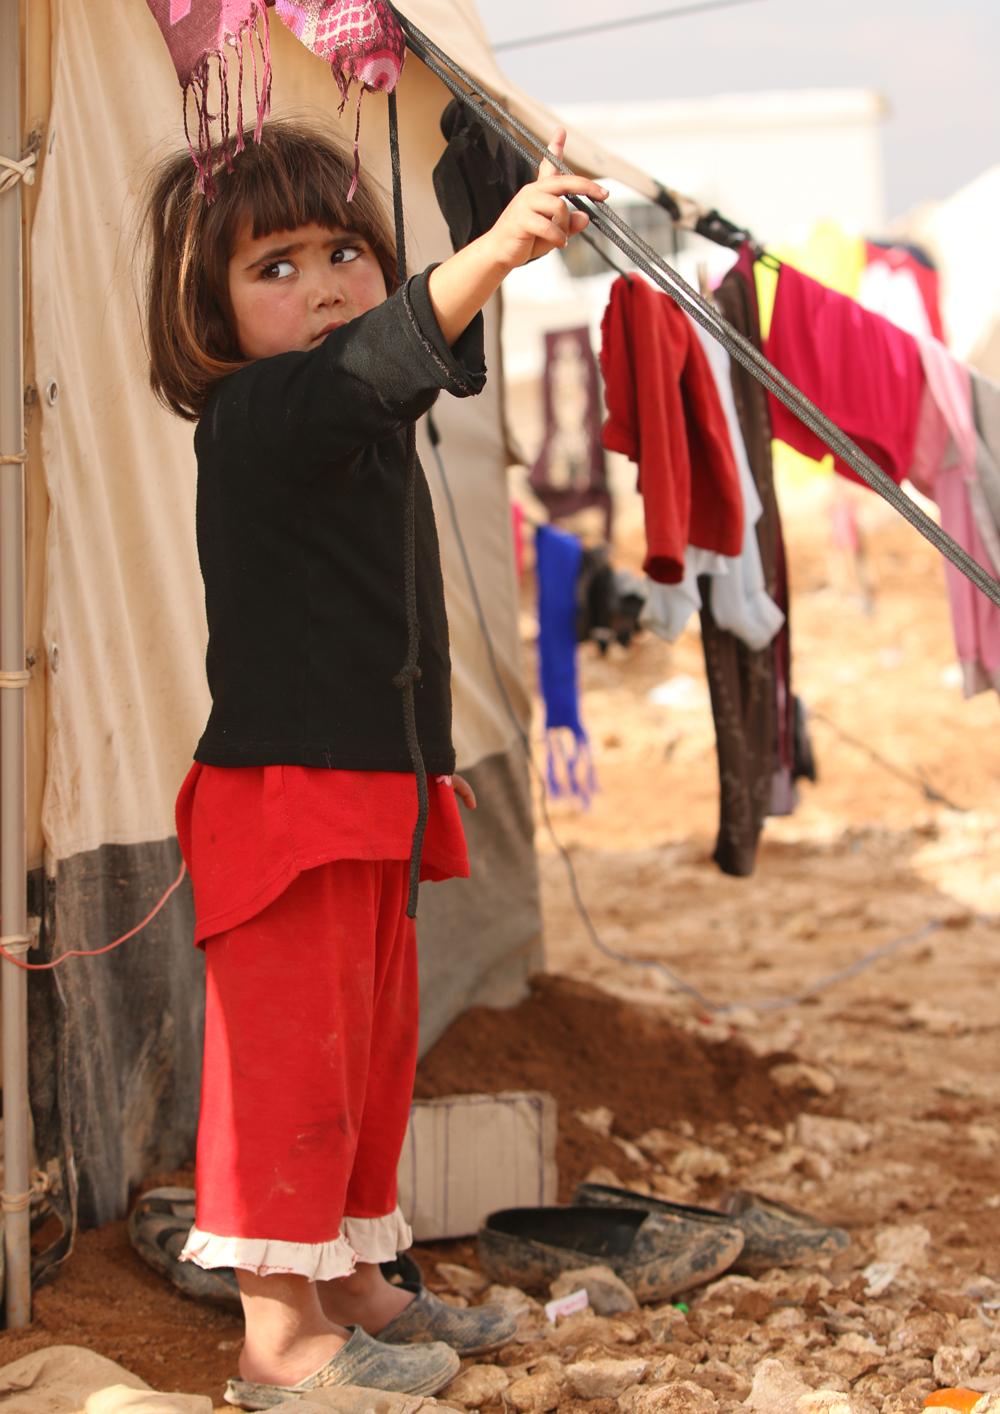 Syrian refugee toddler portrait